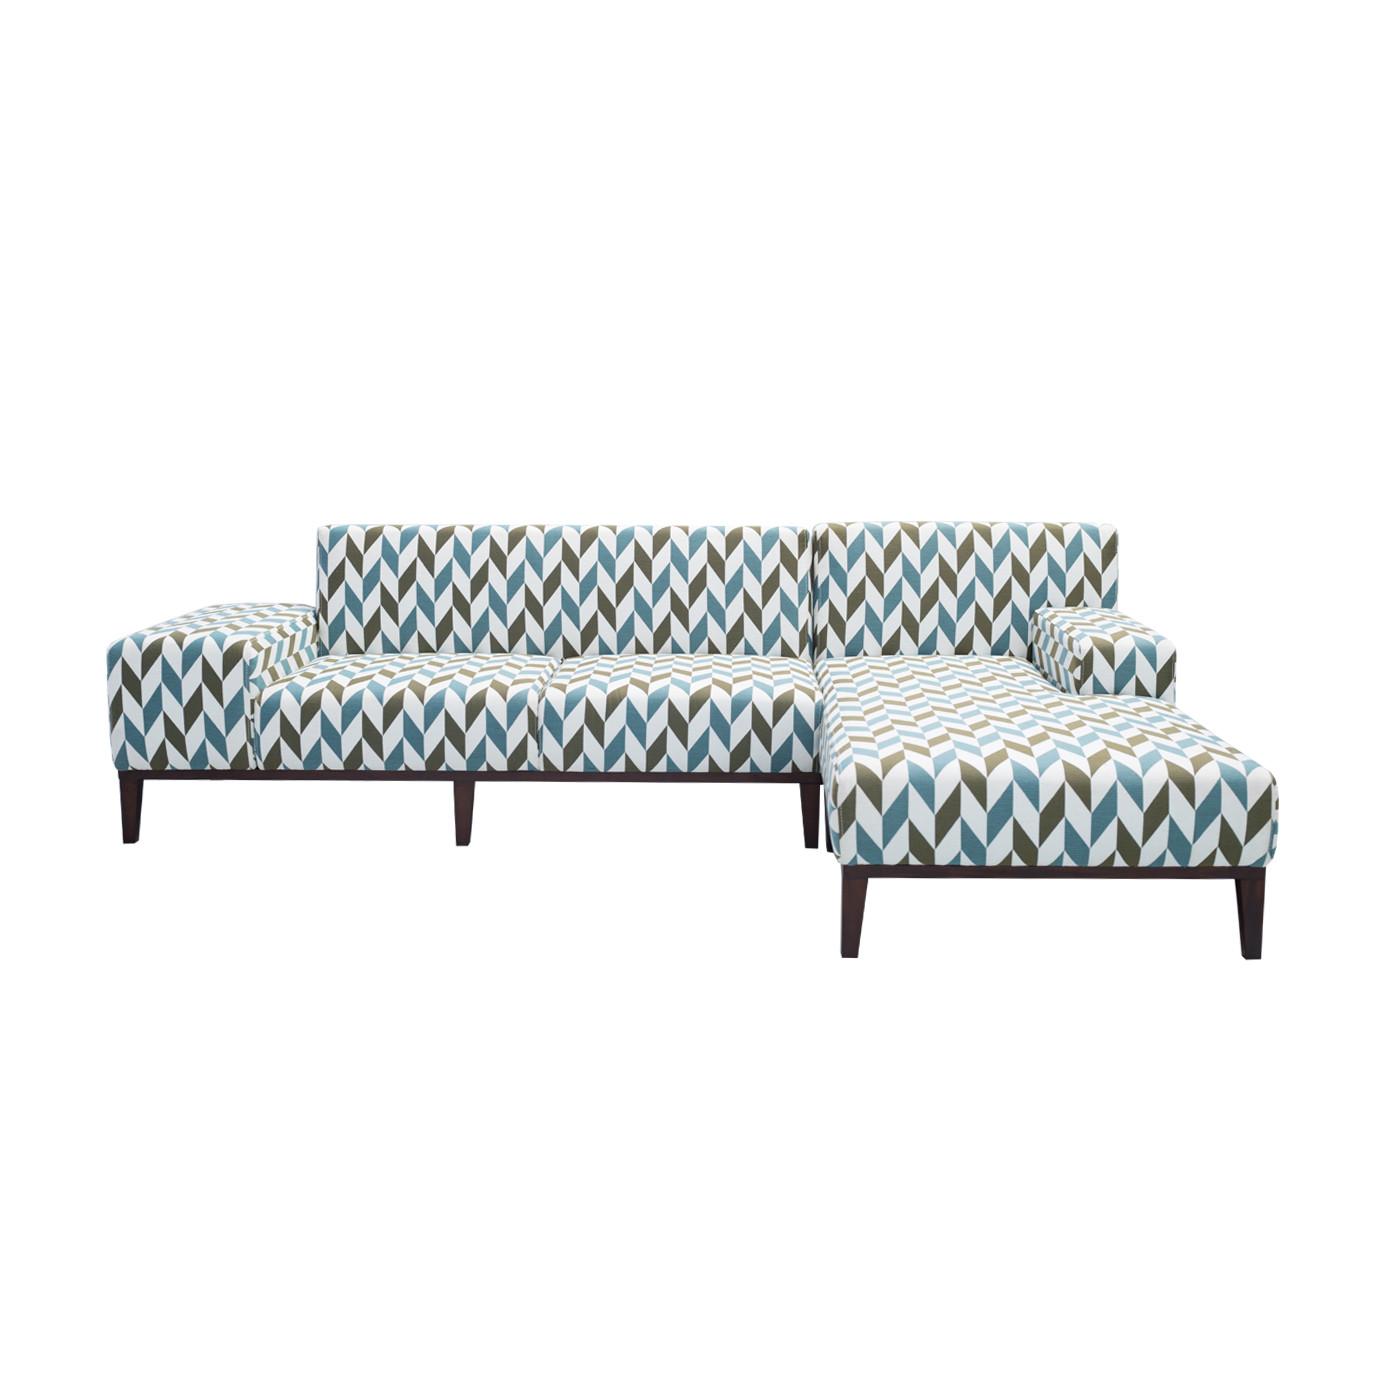 SoHo Geometric Patterned Dark Sofa (Clearance)